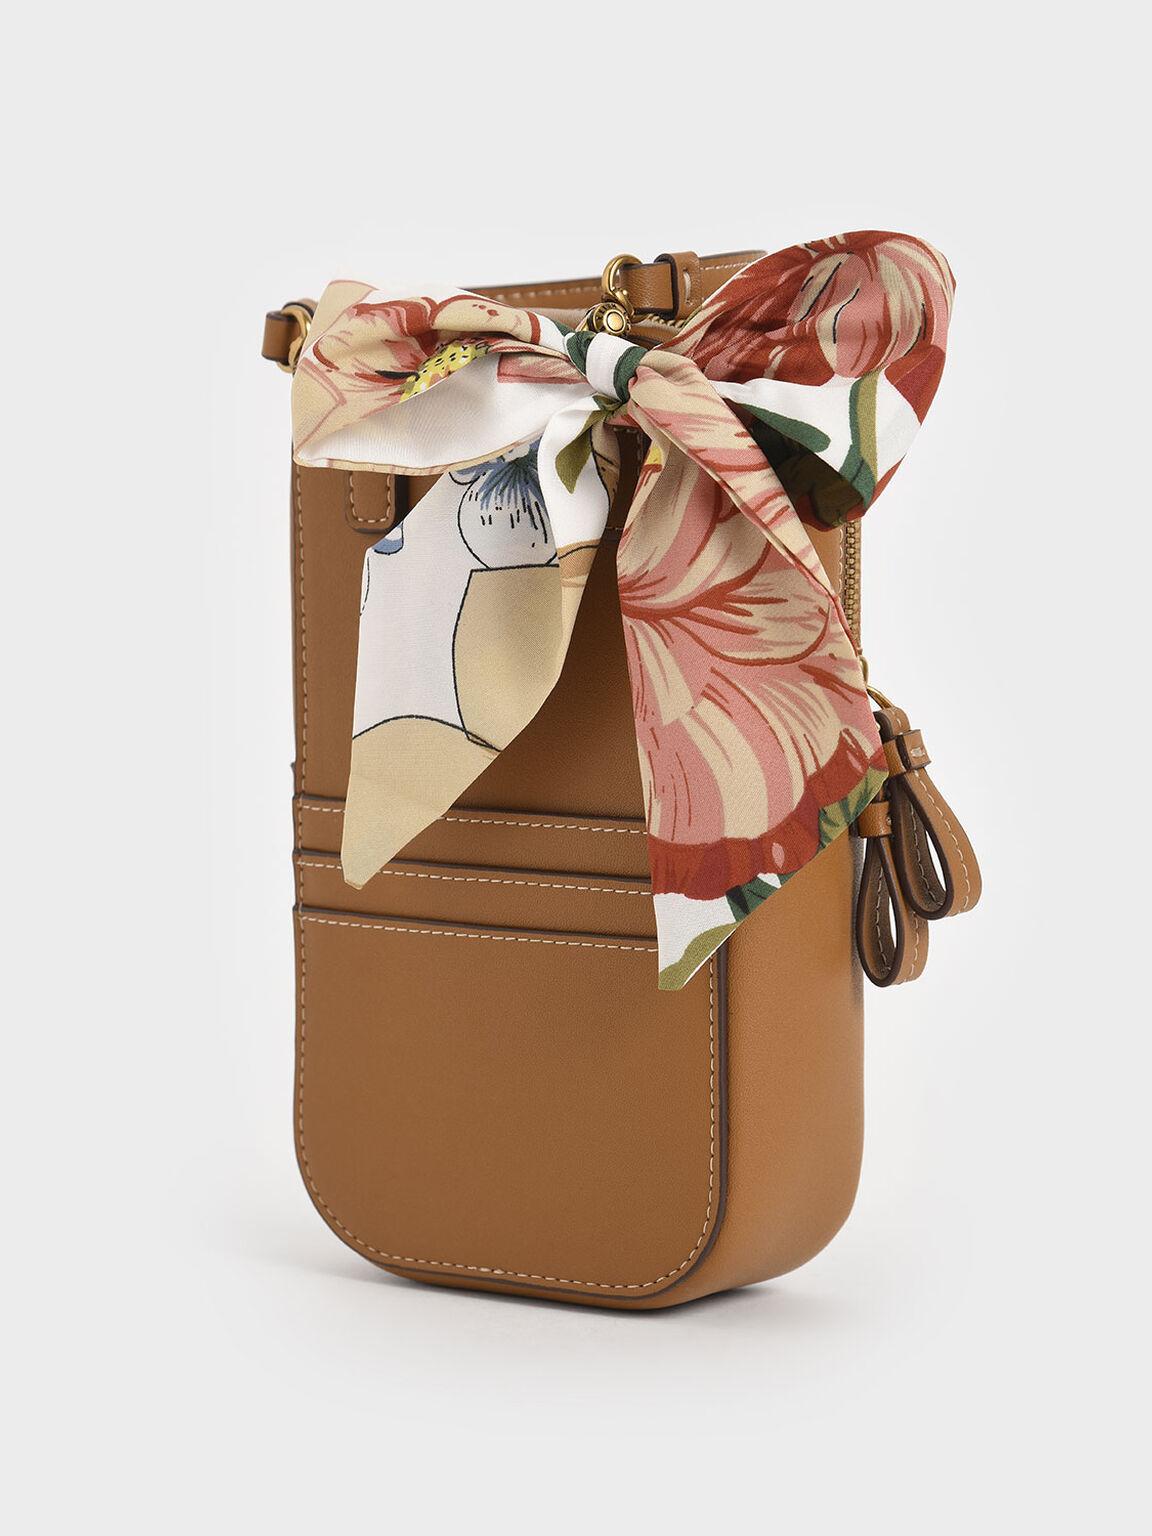 絲巾小收納包, 駝色, hi-res